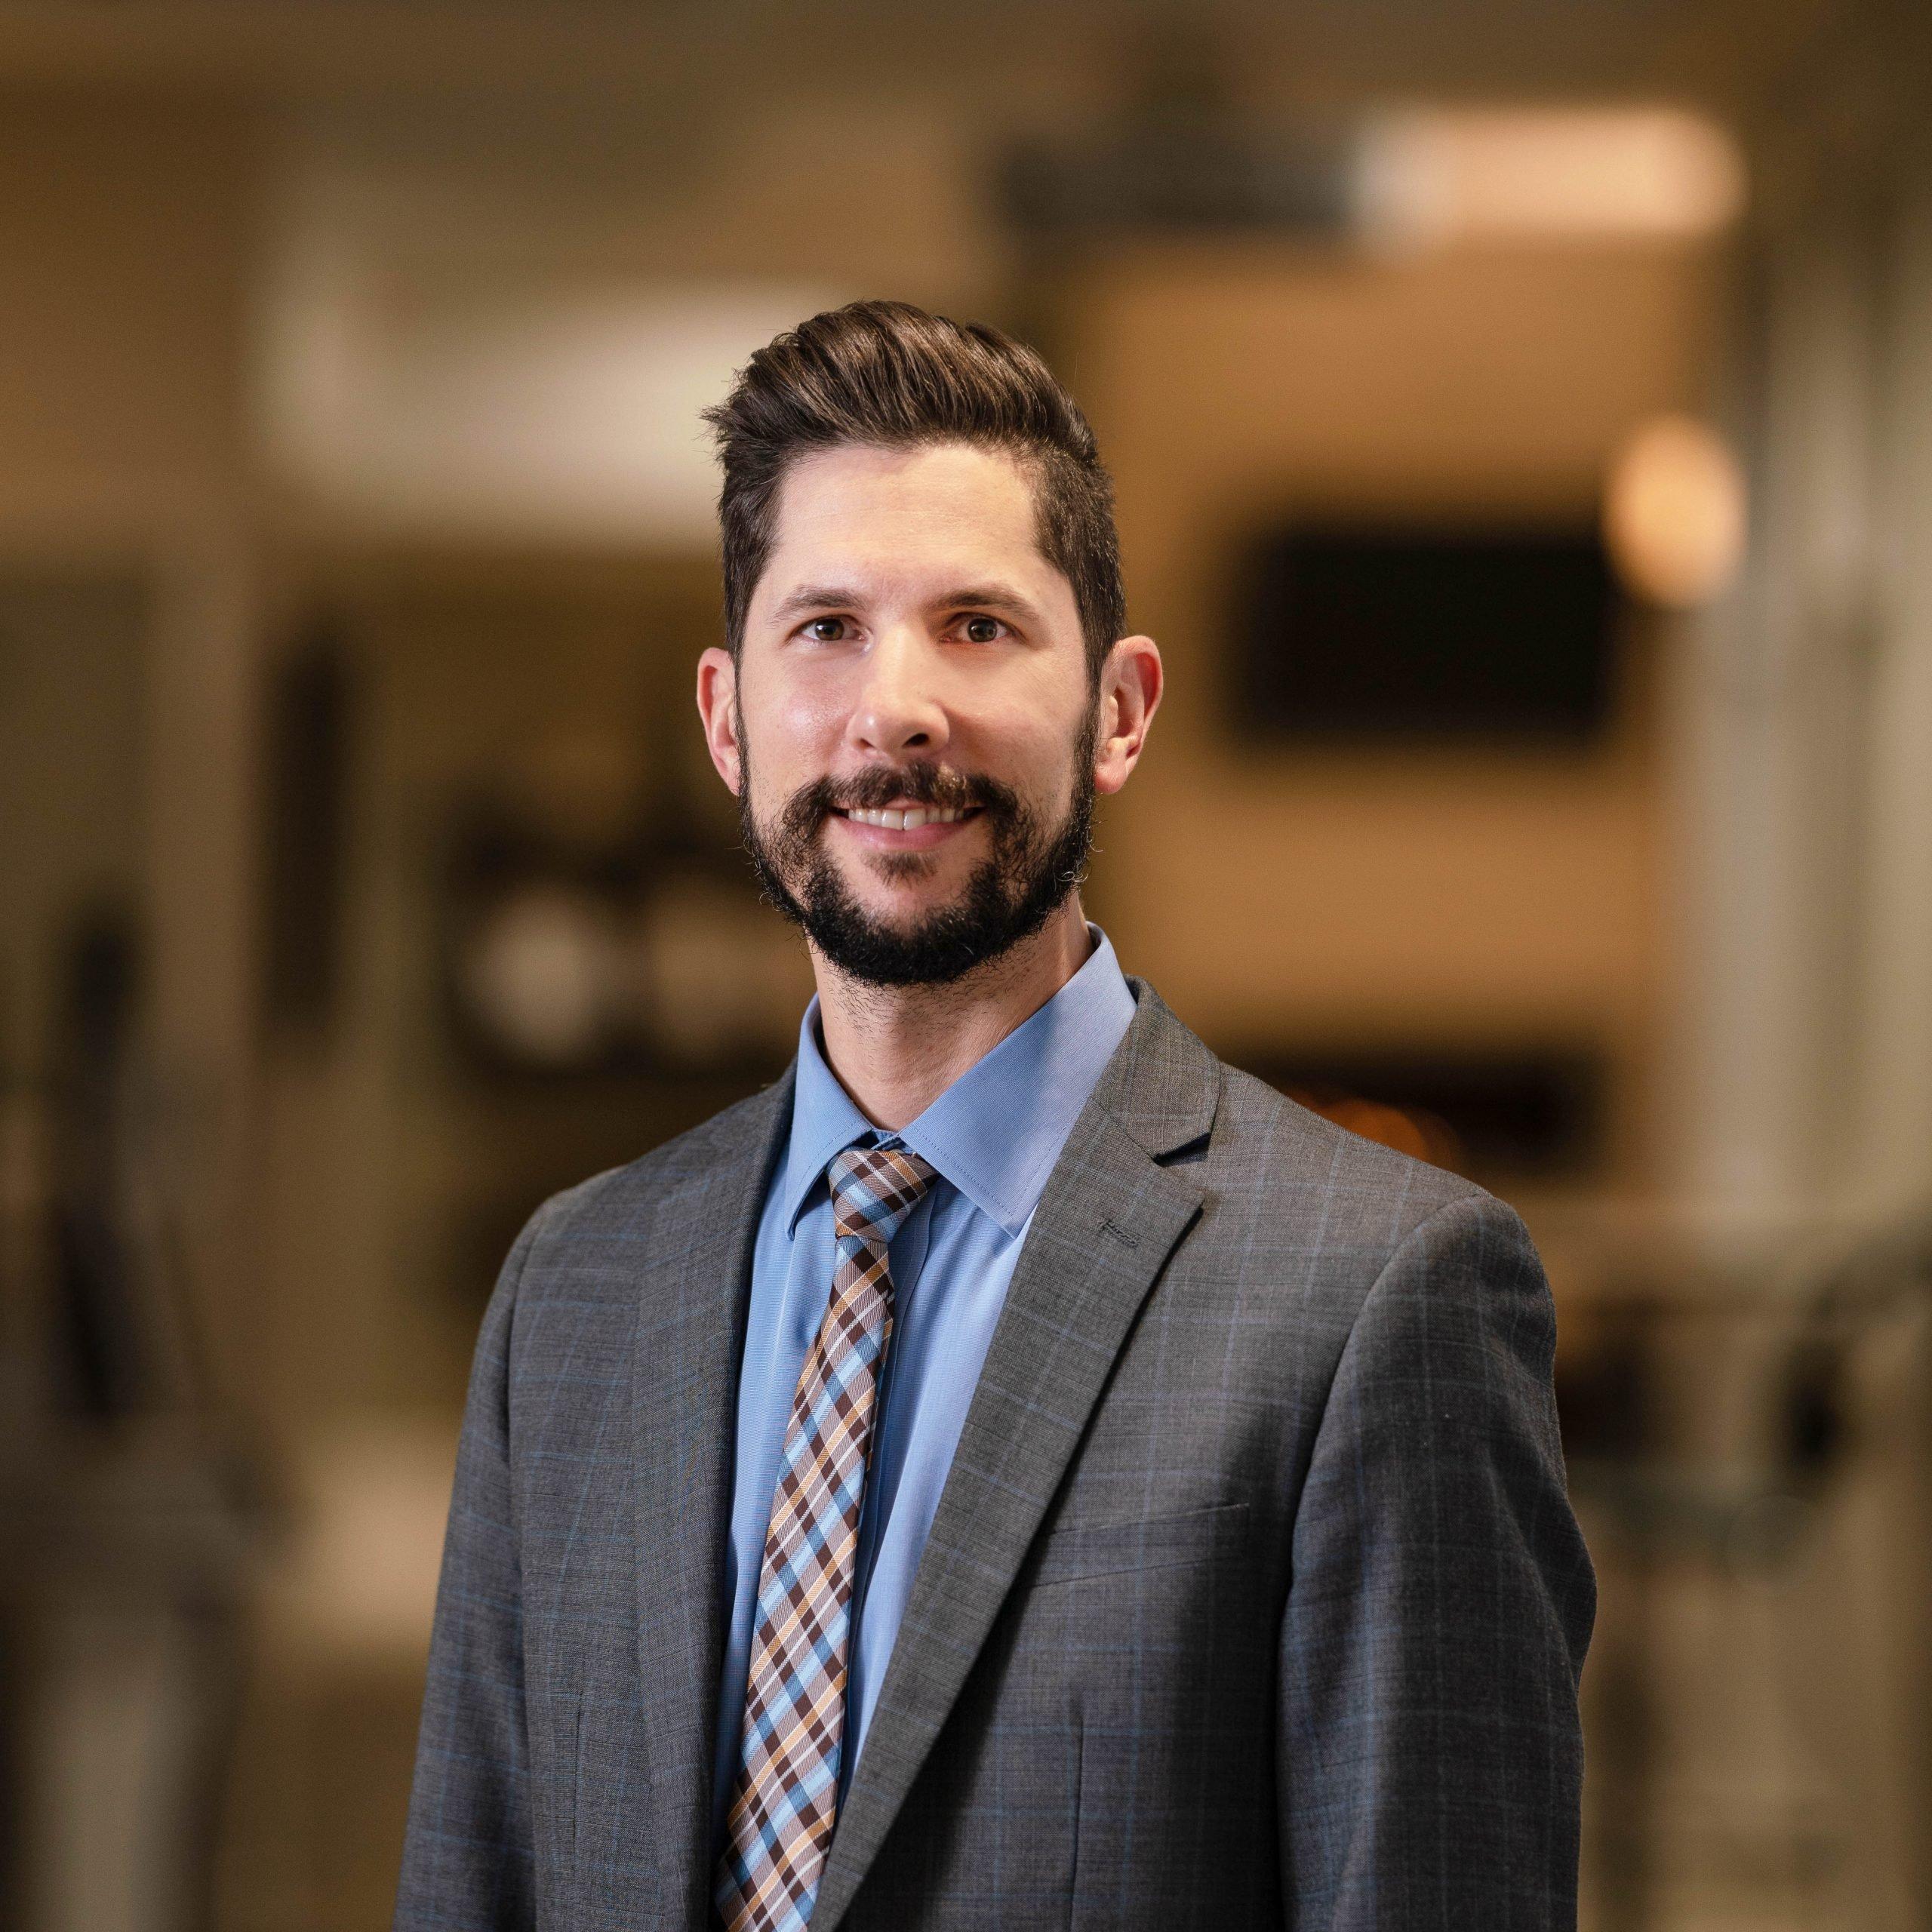 Dr. Nathan Pezda